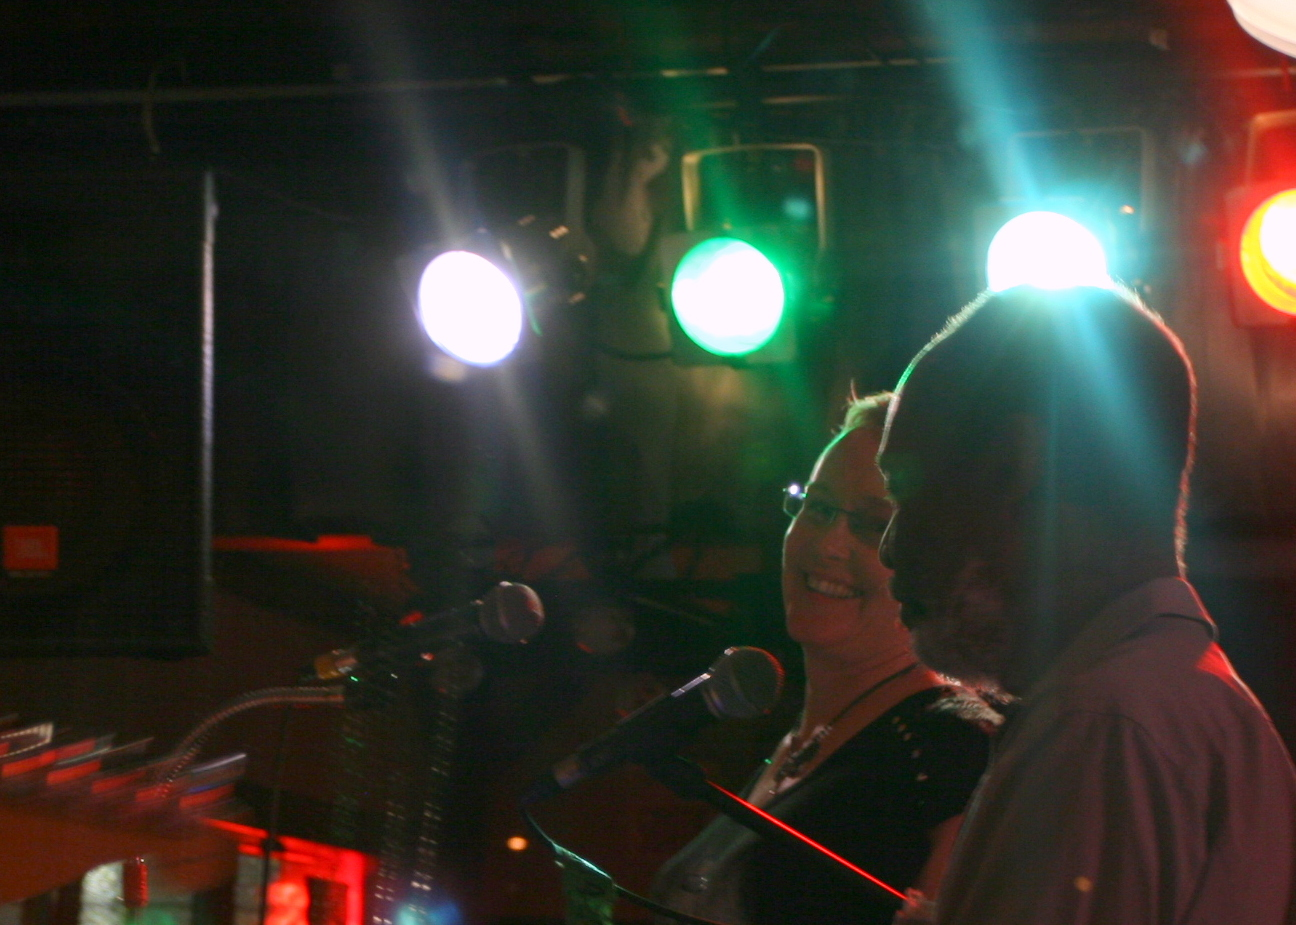 Vickie-Ted-Lights.jpg